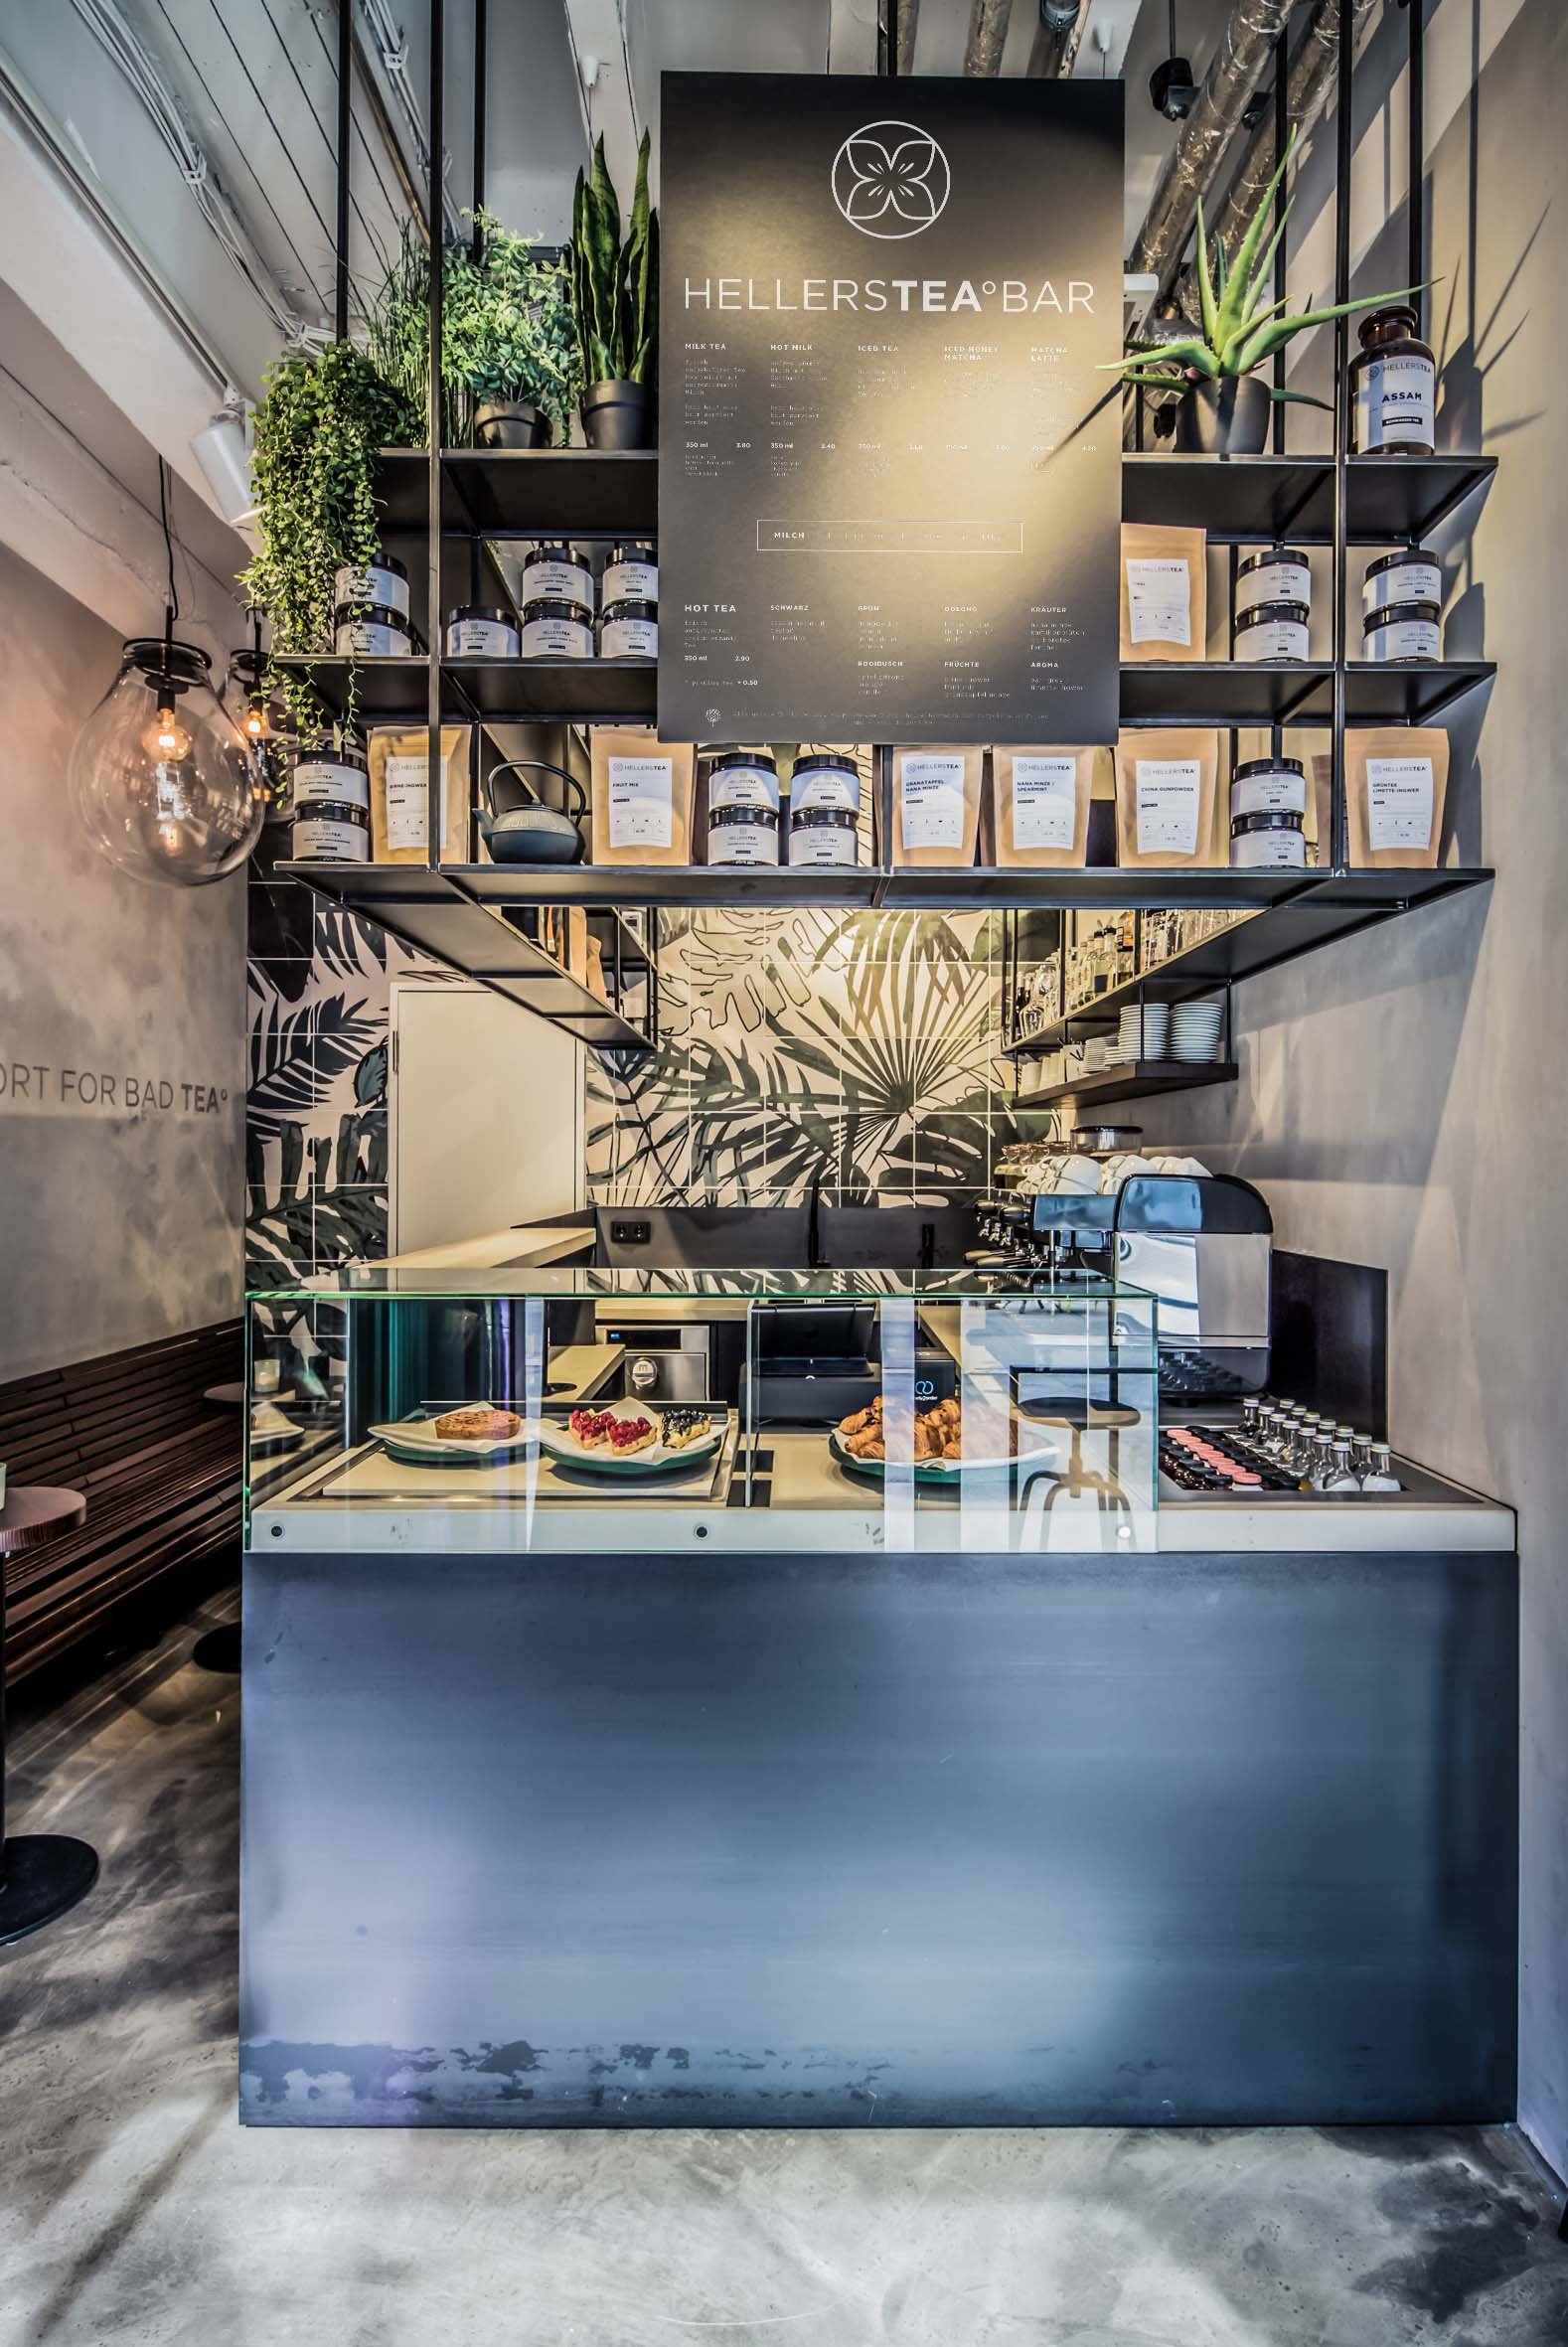 Raumdesign Inneneinrichtung Hellers Tea Bar Nobla Raumgestaltung Karlsruhe